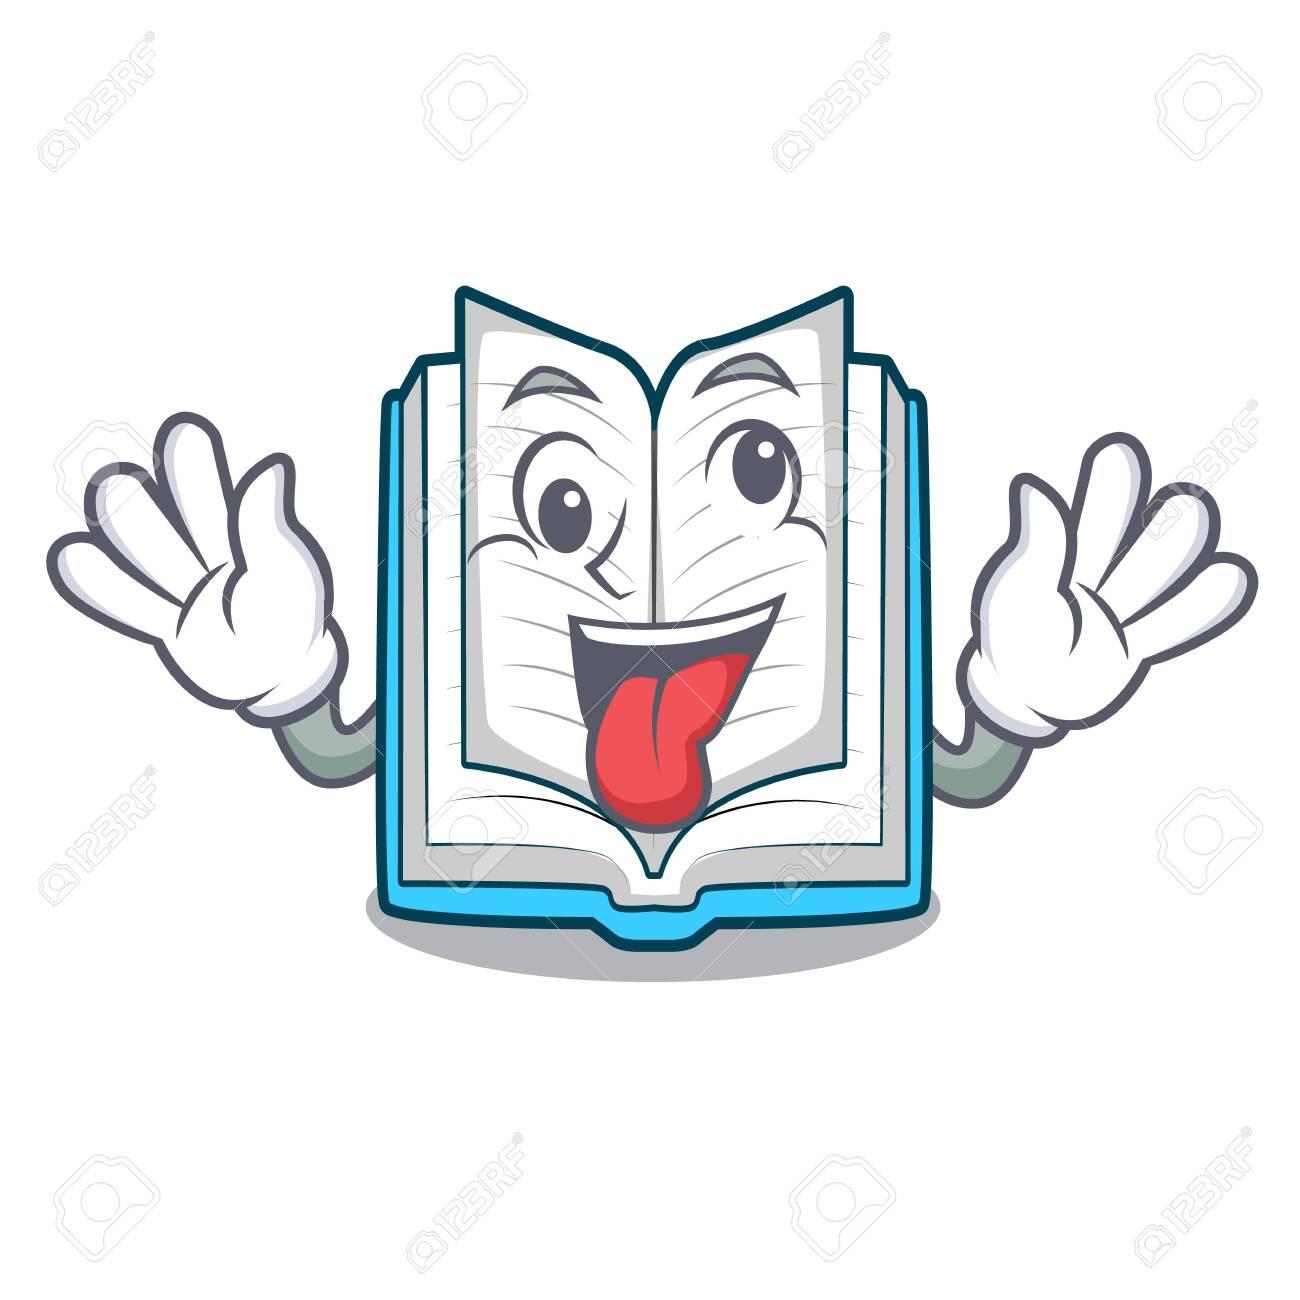 Crazy opened book in the cartoon box vetor illustration - 124483806